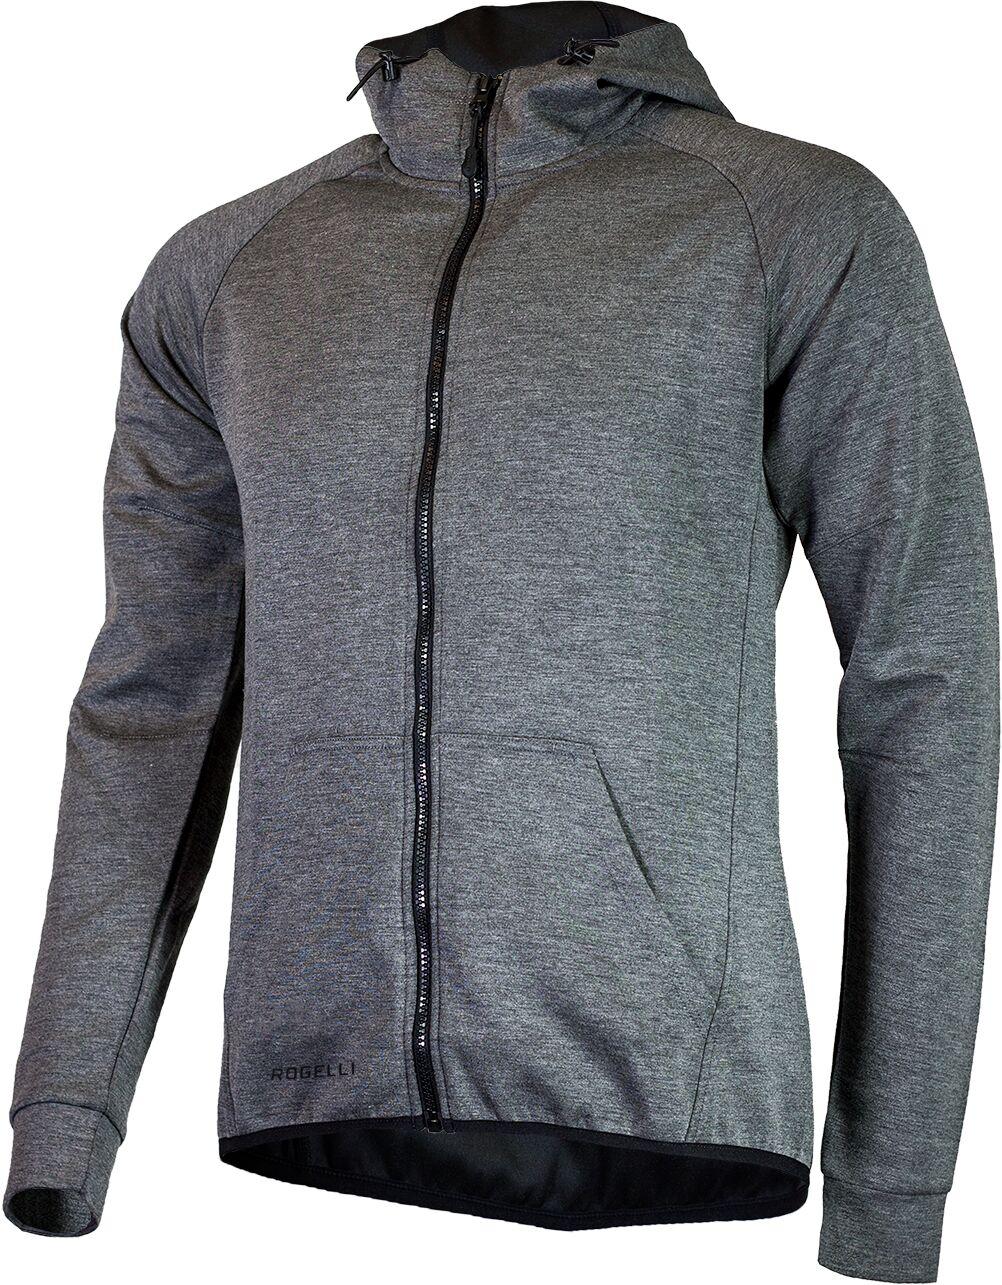 ROGELLI bluza męska z kapturem TRENING grey Rozmiar: S,050.600.XL